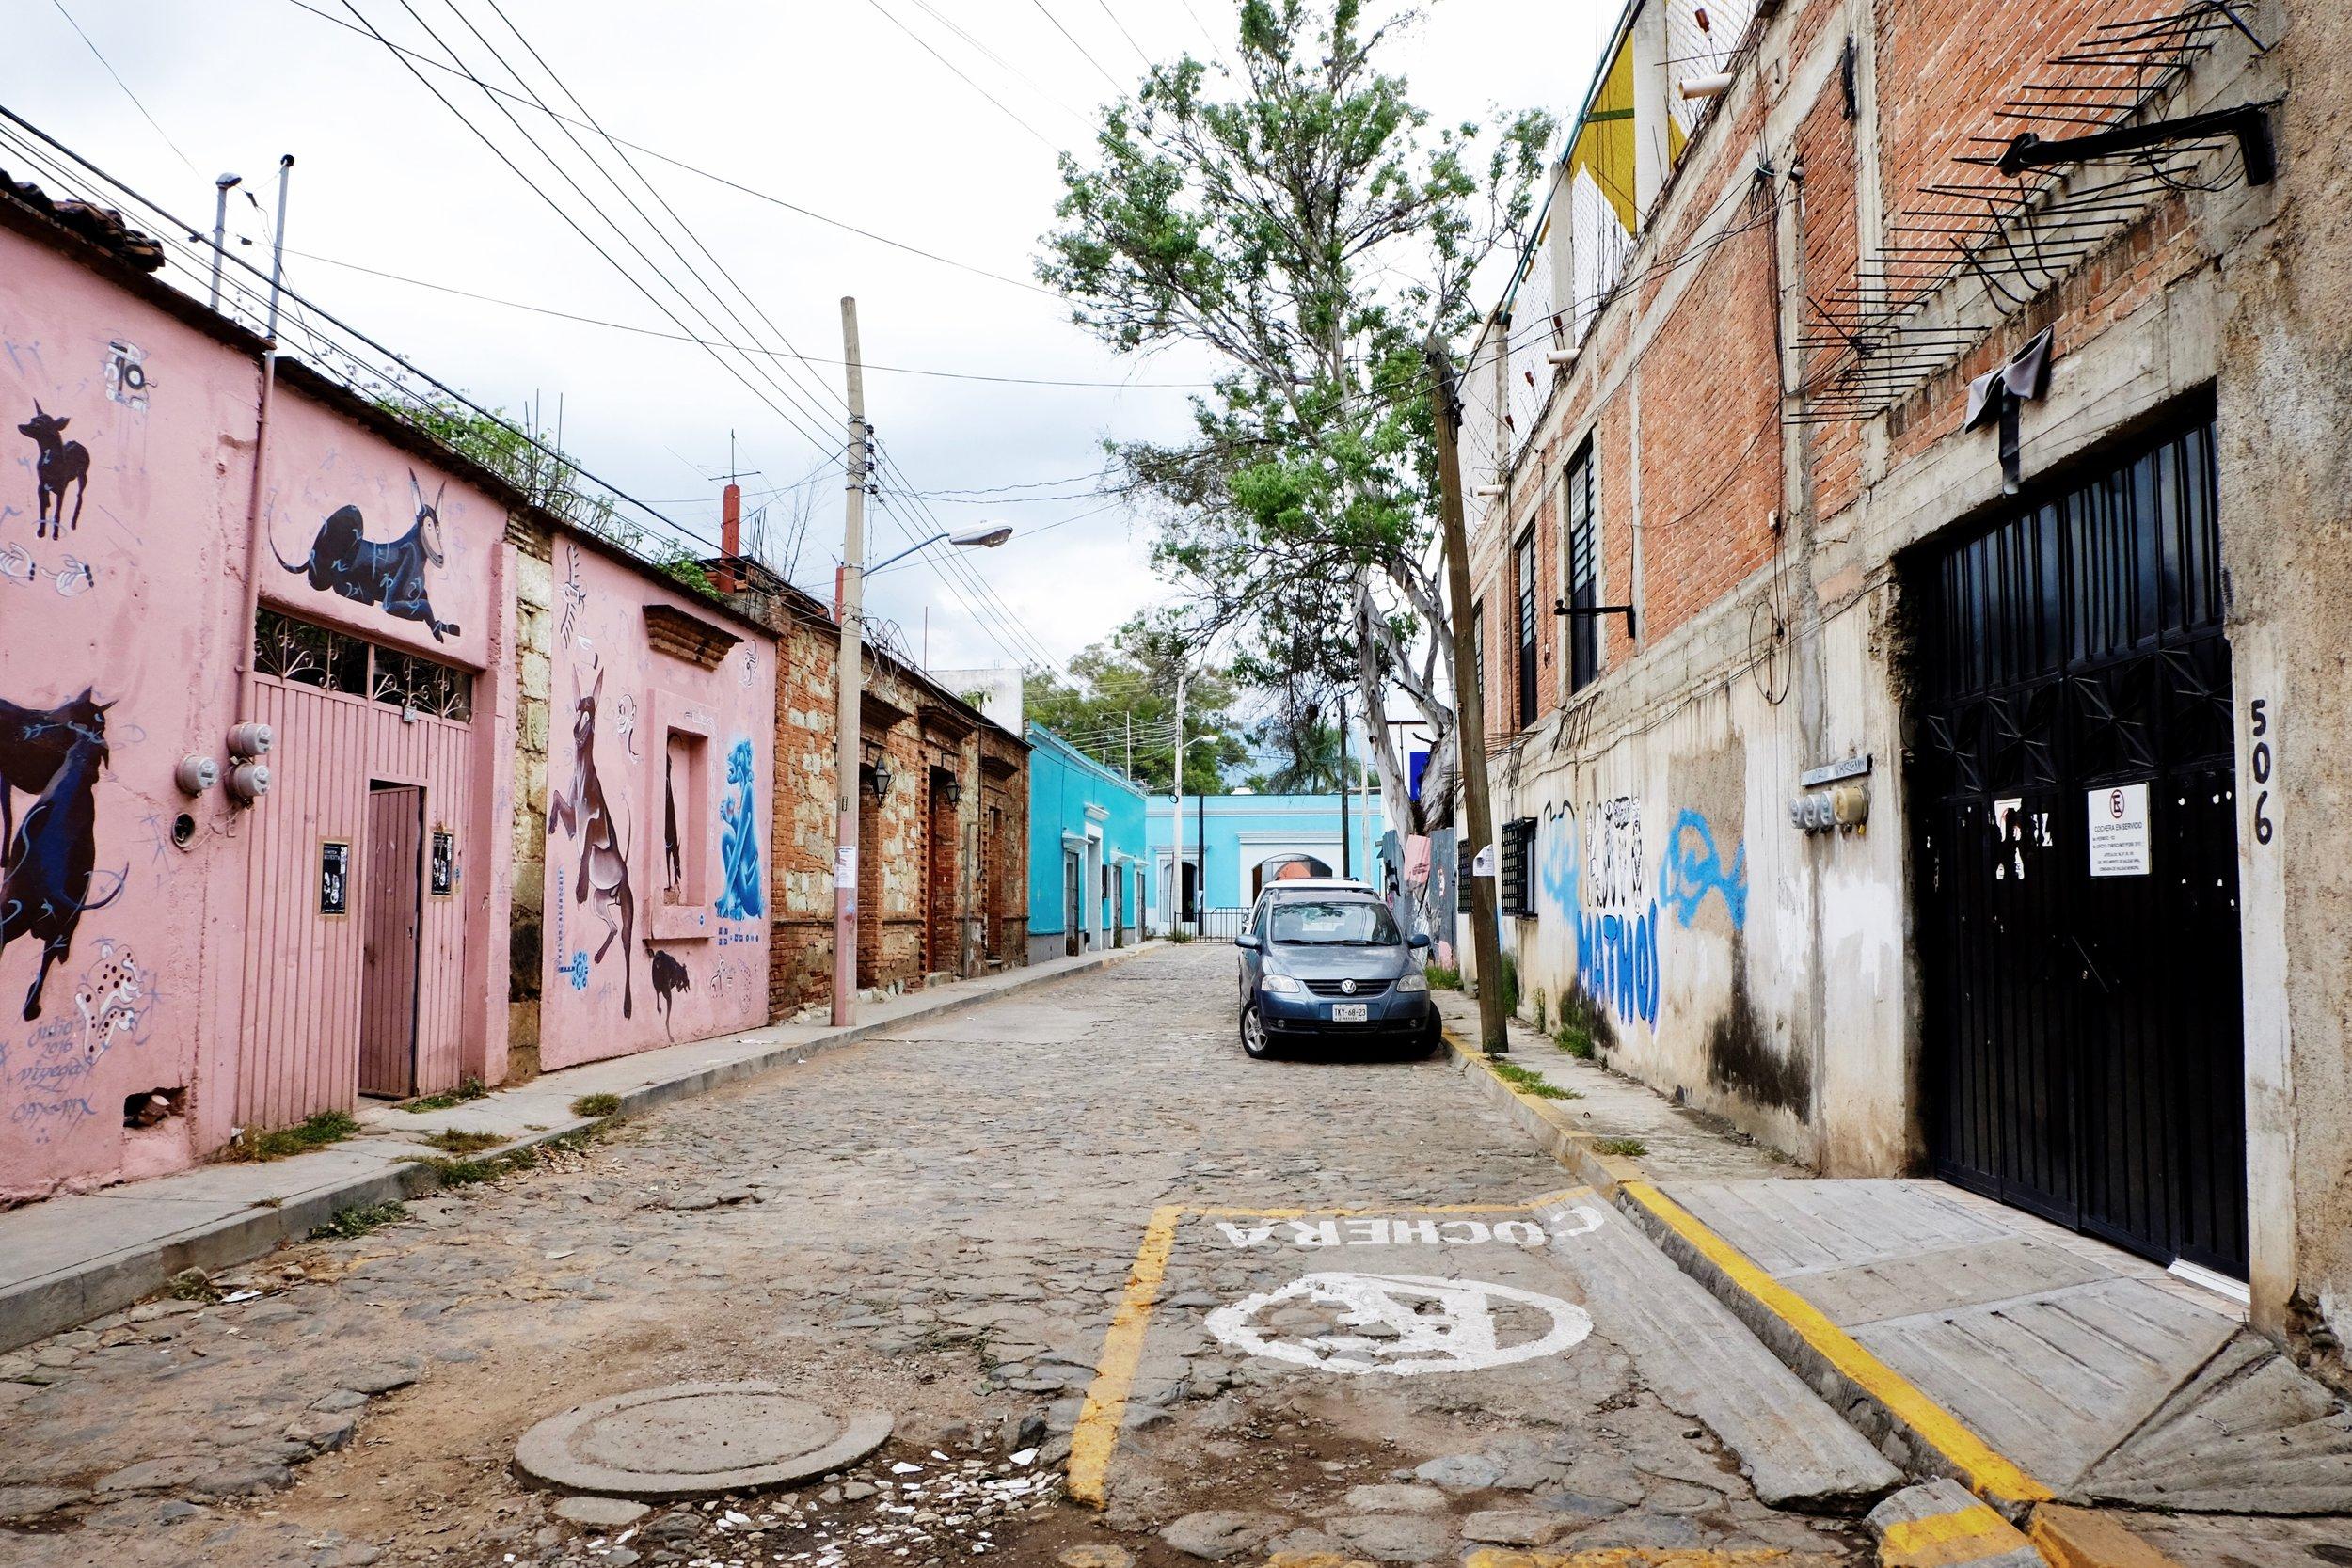 The decorative street Tierra Blanca lives on.